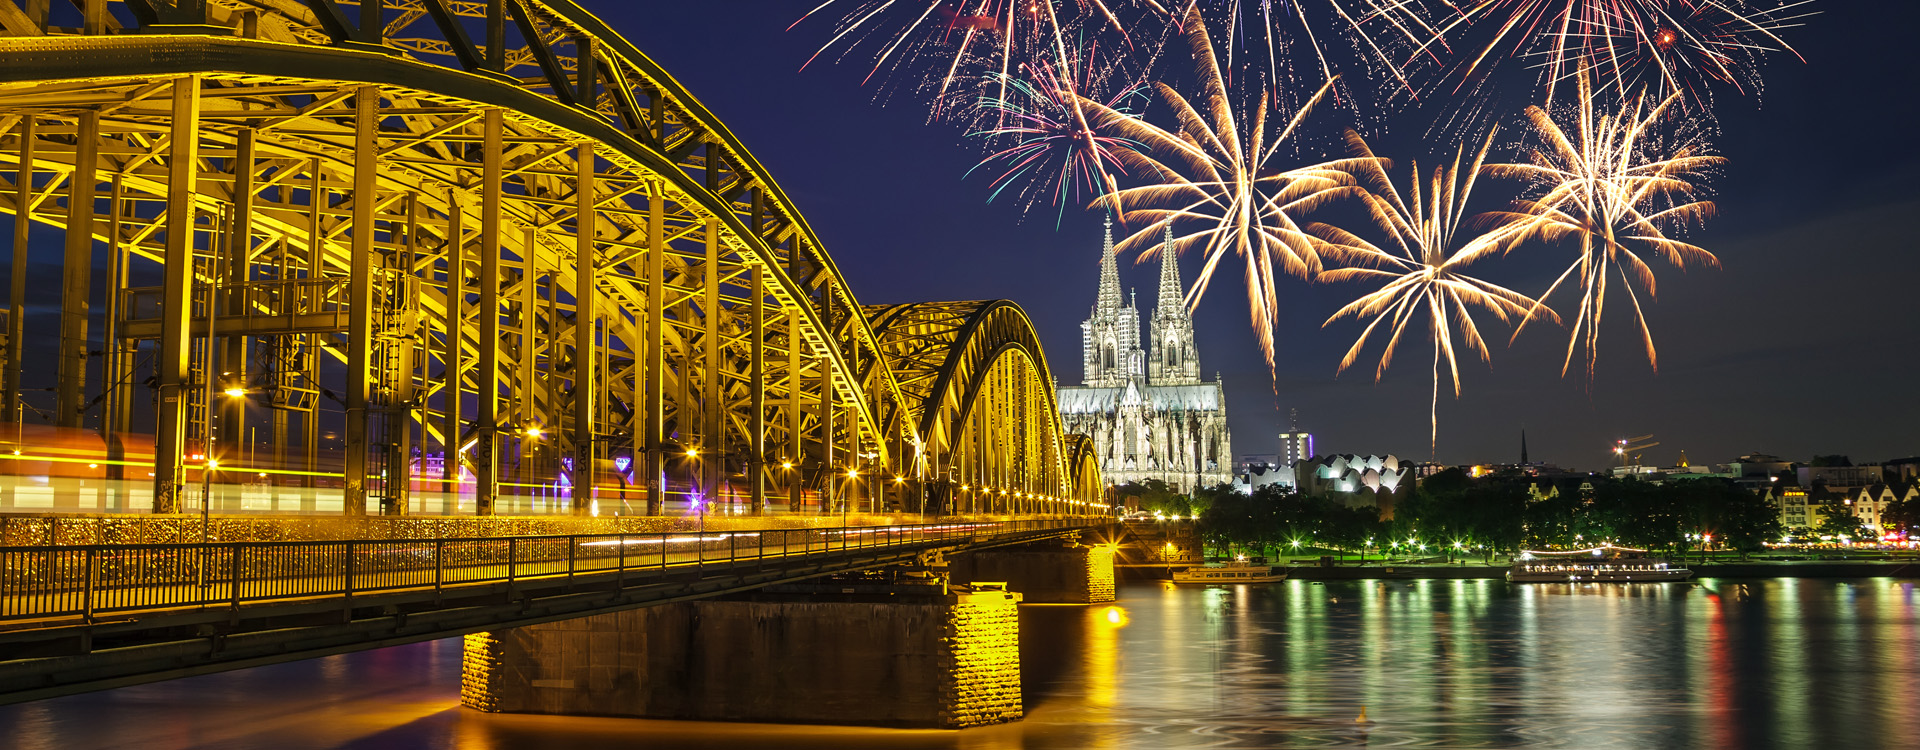 Silvester Feiern Köln